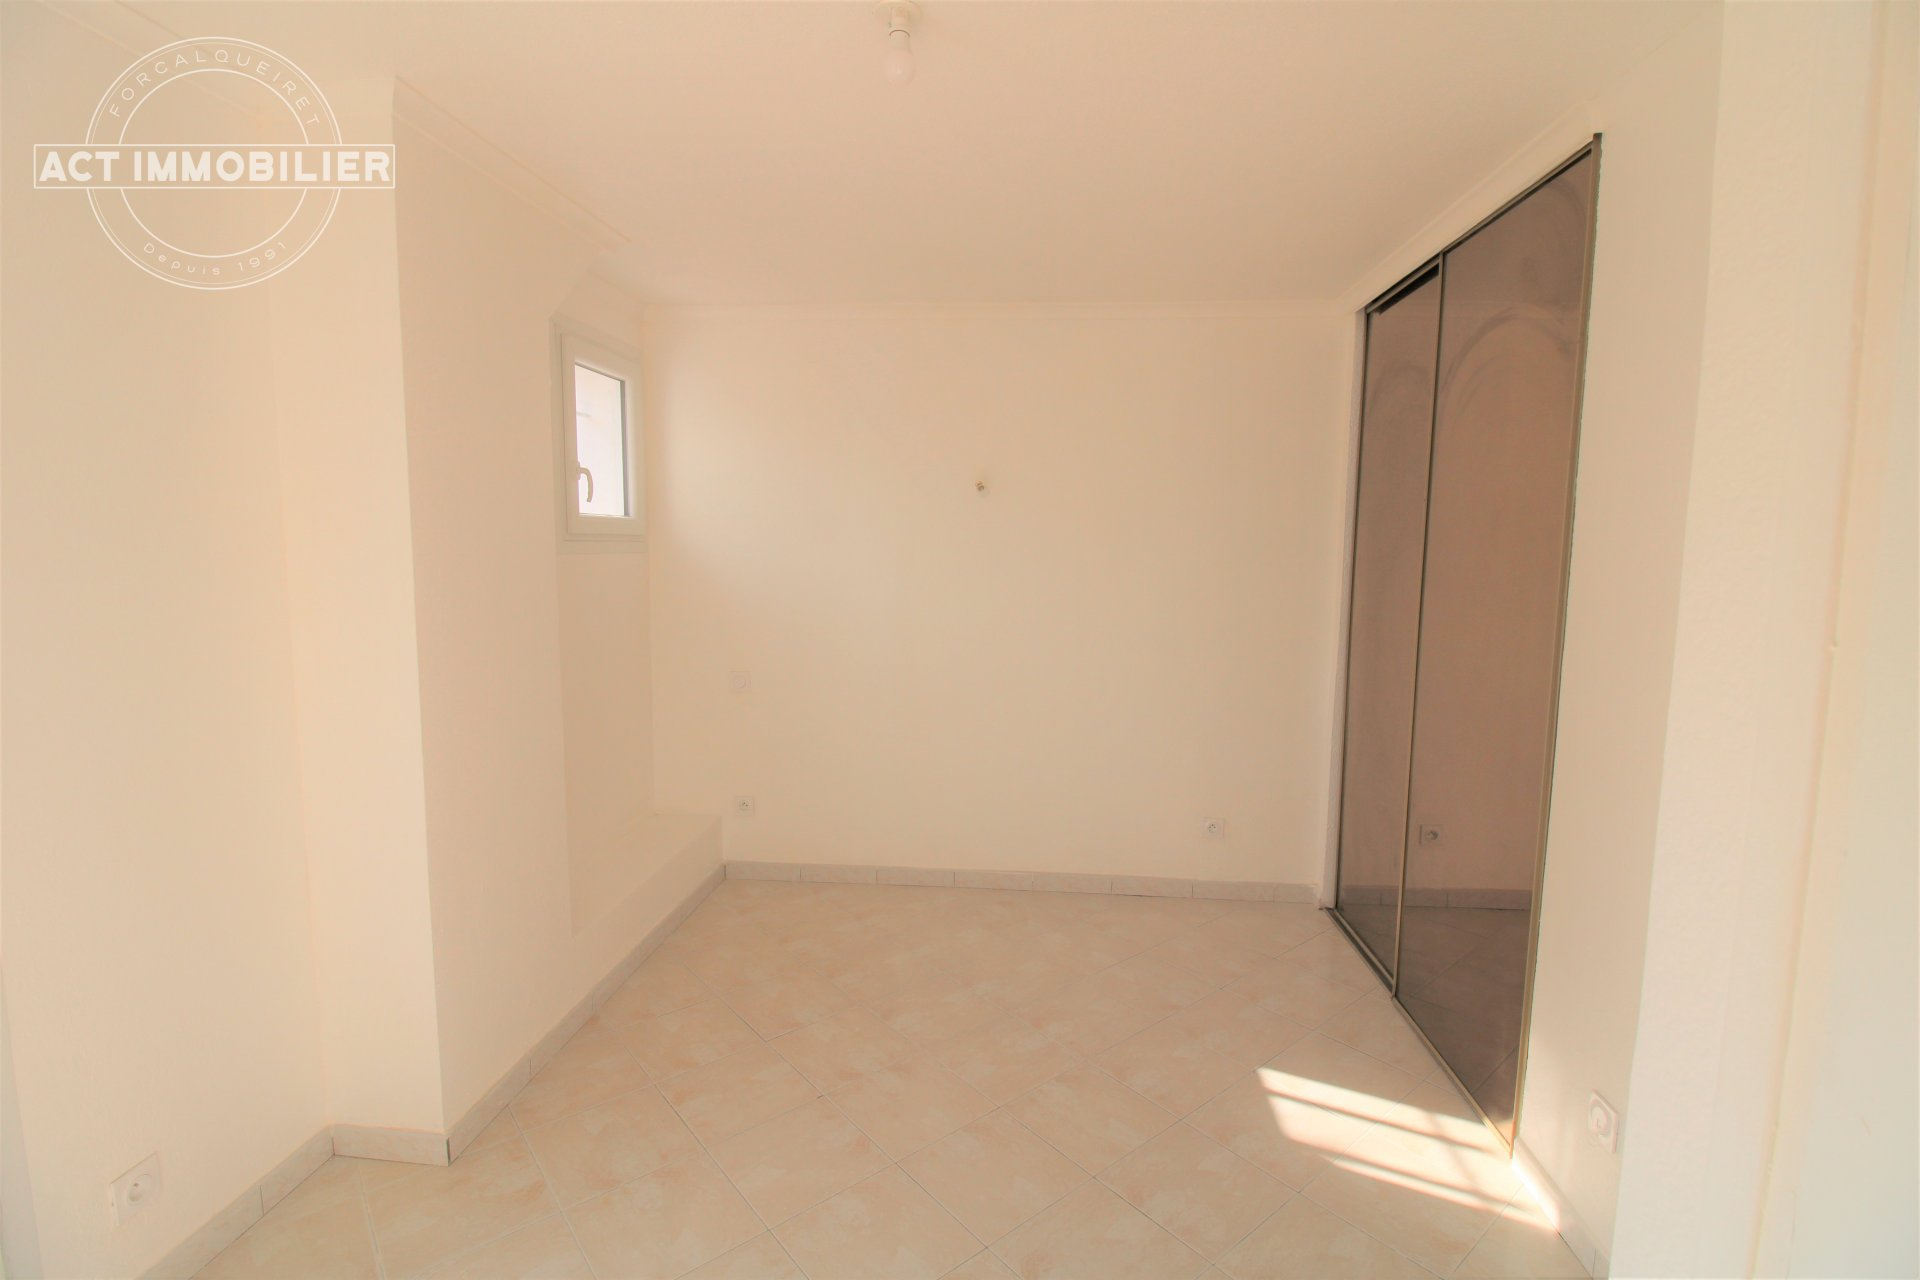 Bas de villa de 72m²  sur terrain de 430 m² env.